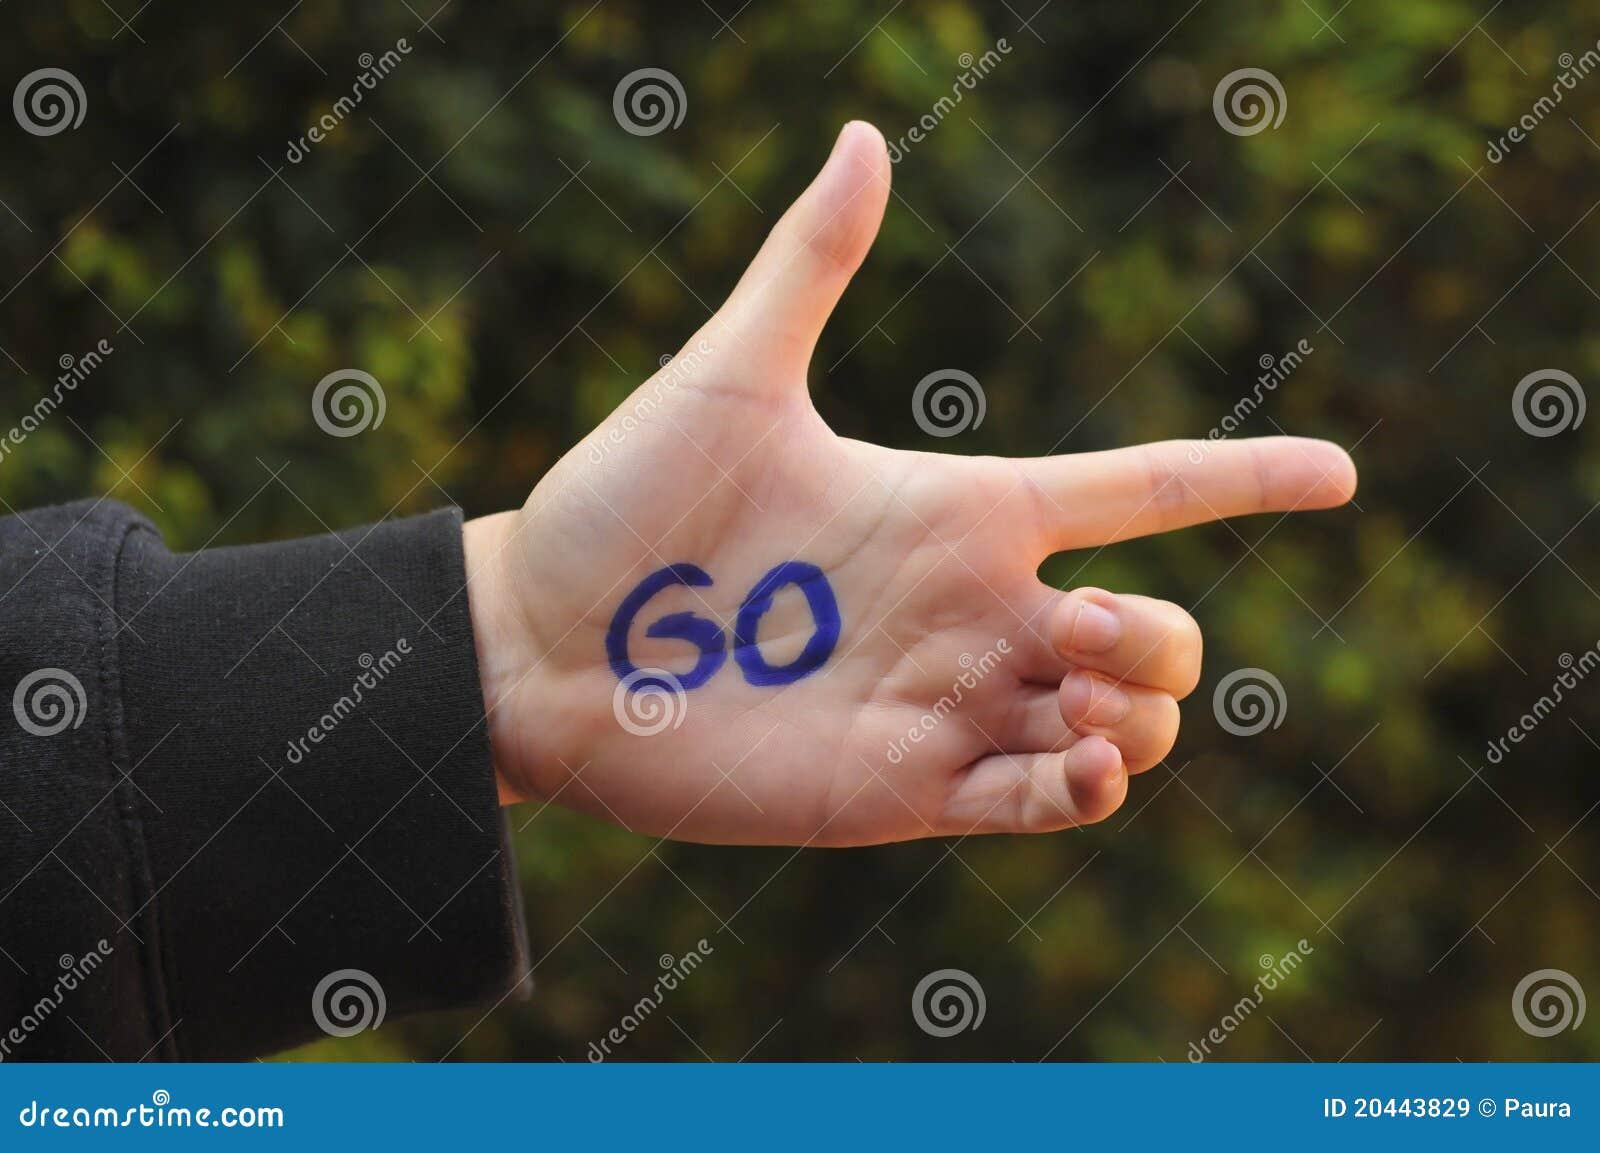 Go ahead hand gesture